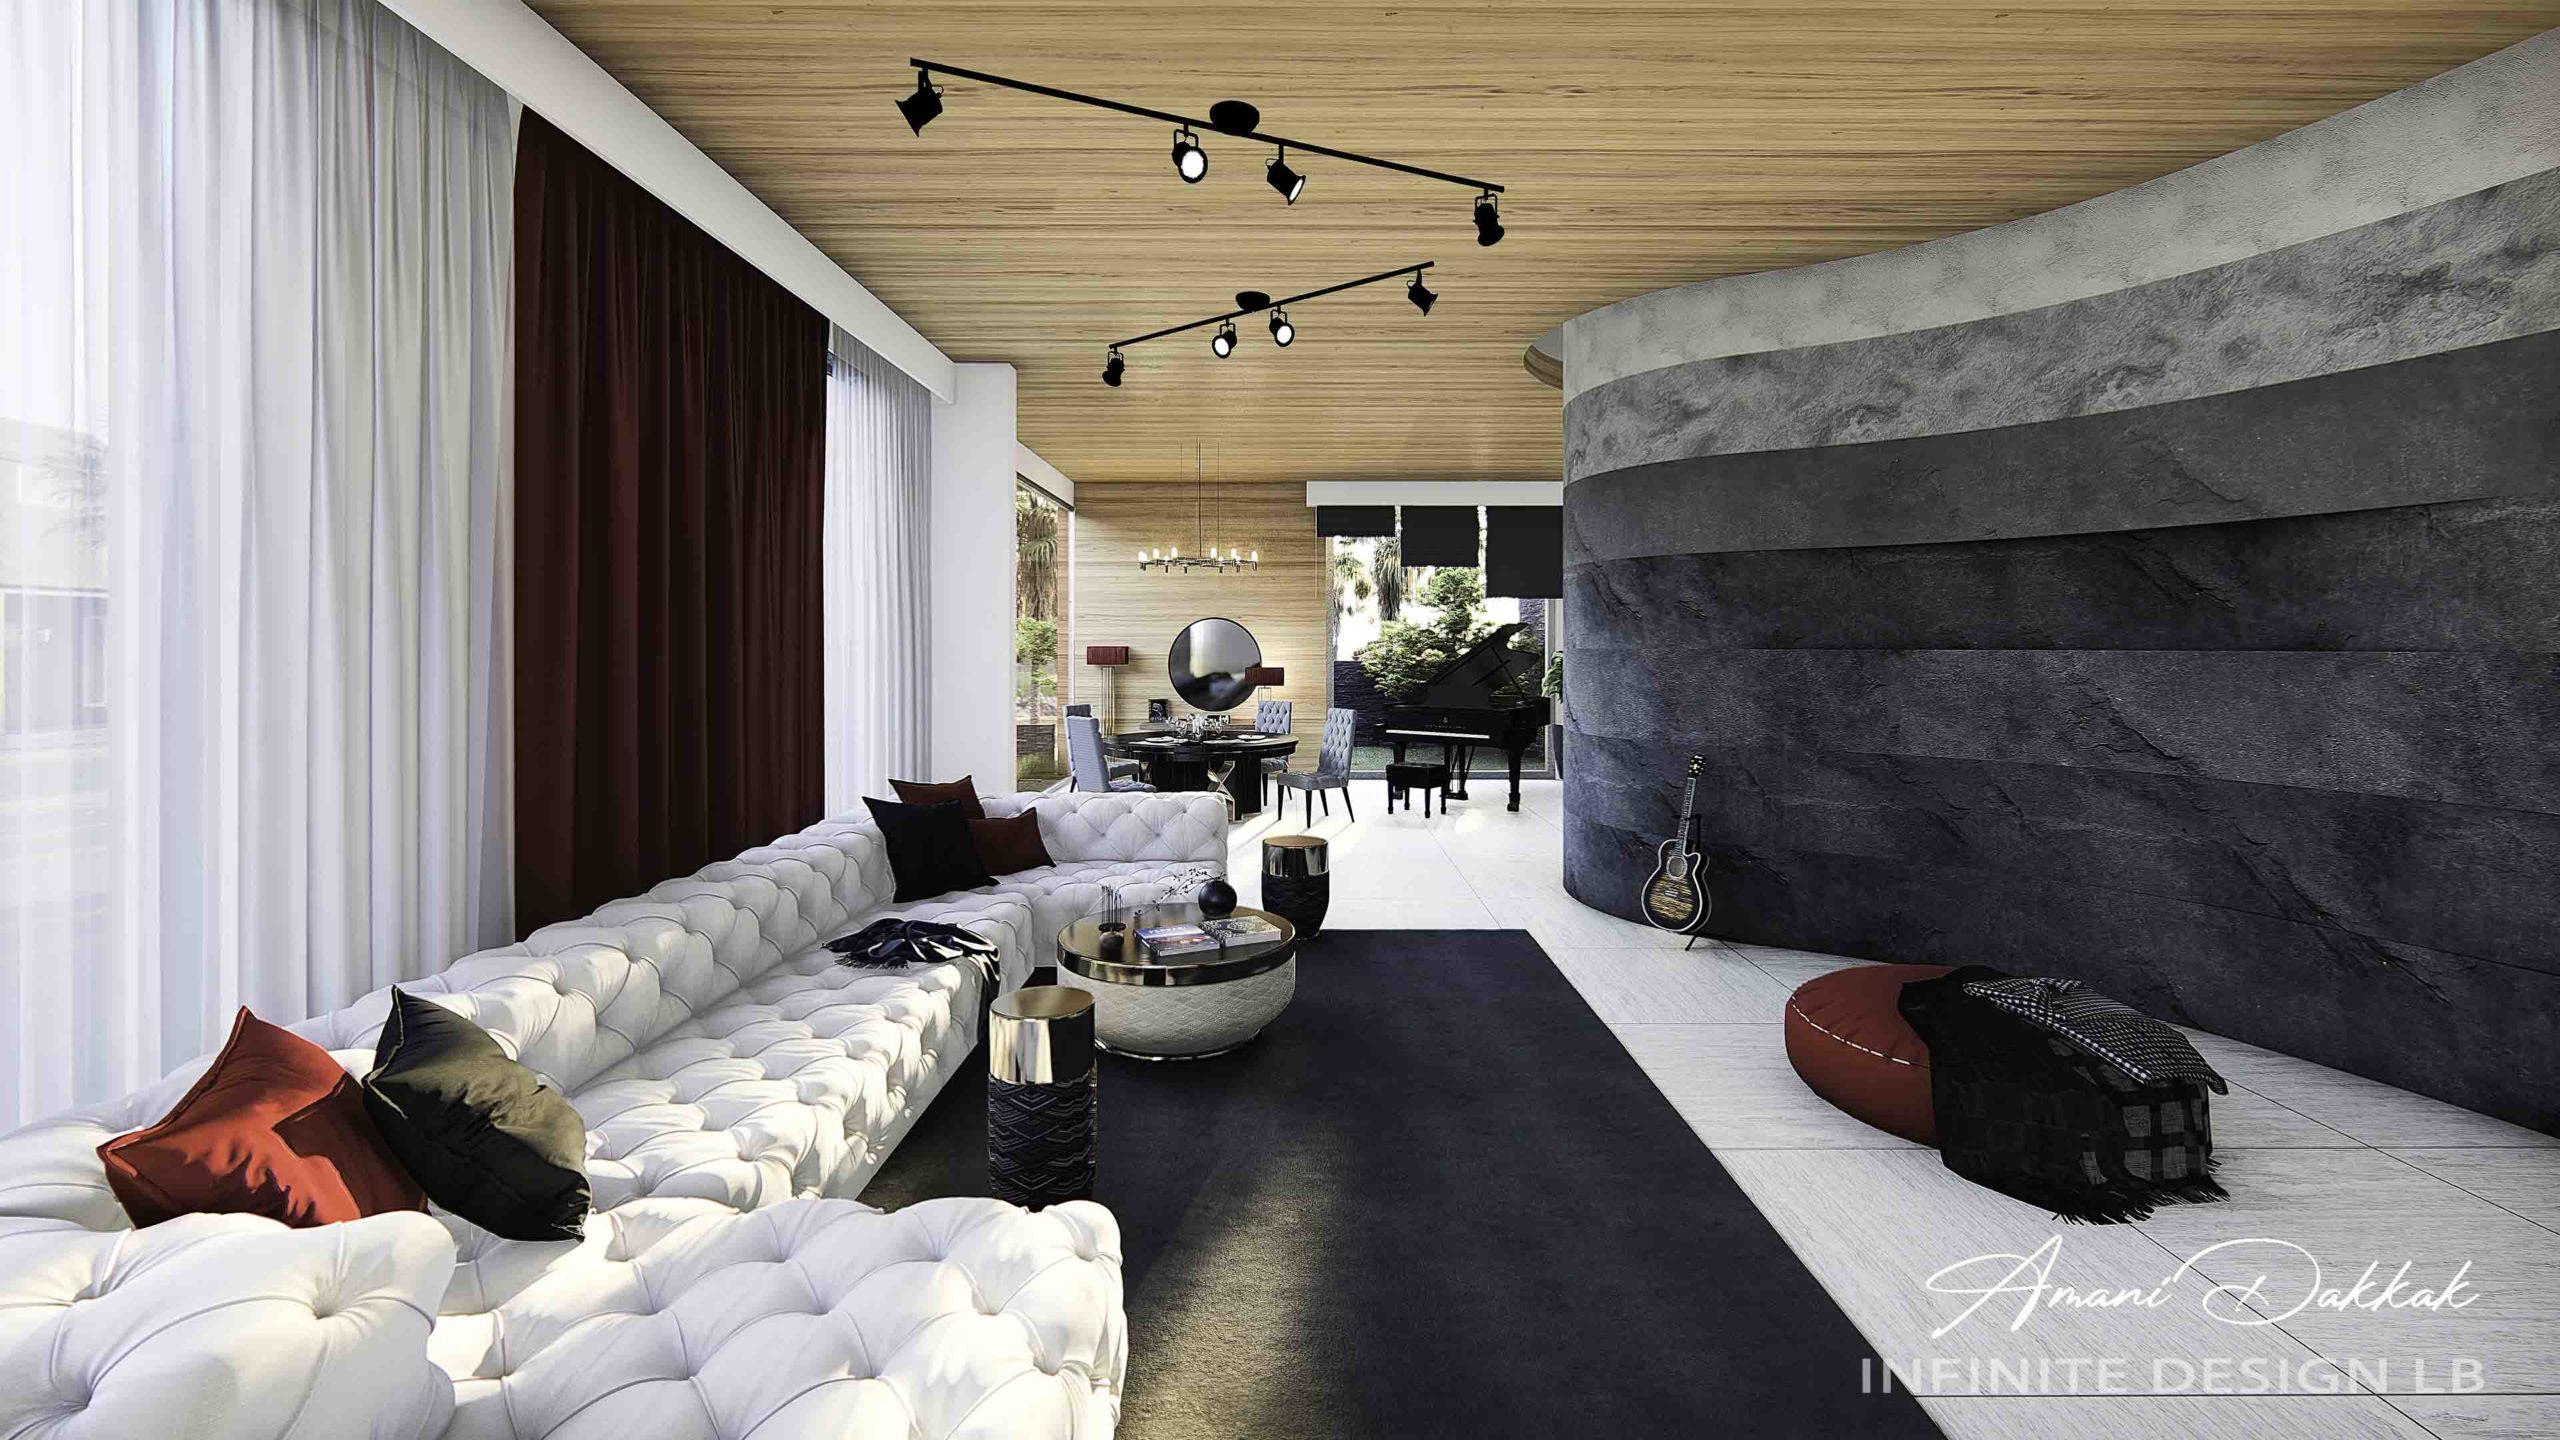 Luxury Modern House Decoration | By Amani Dakkak